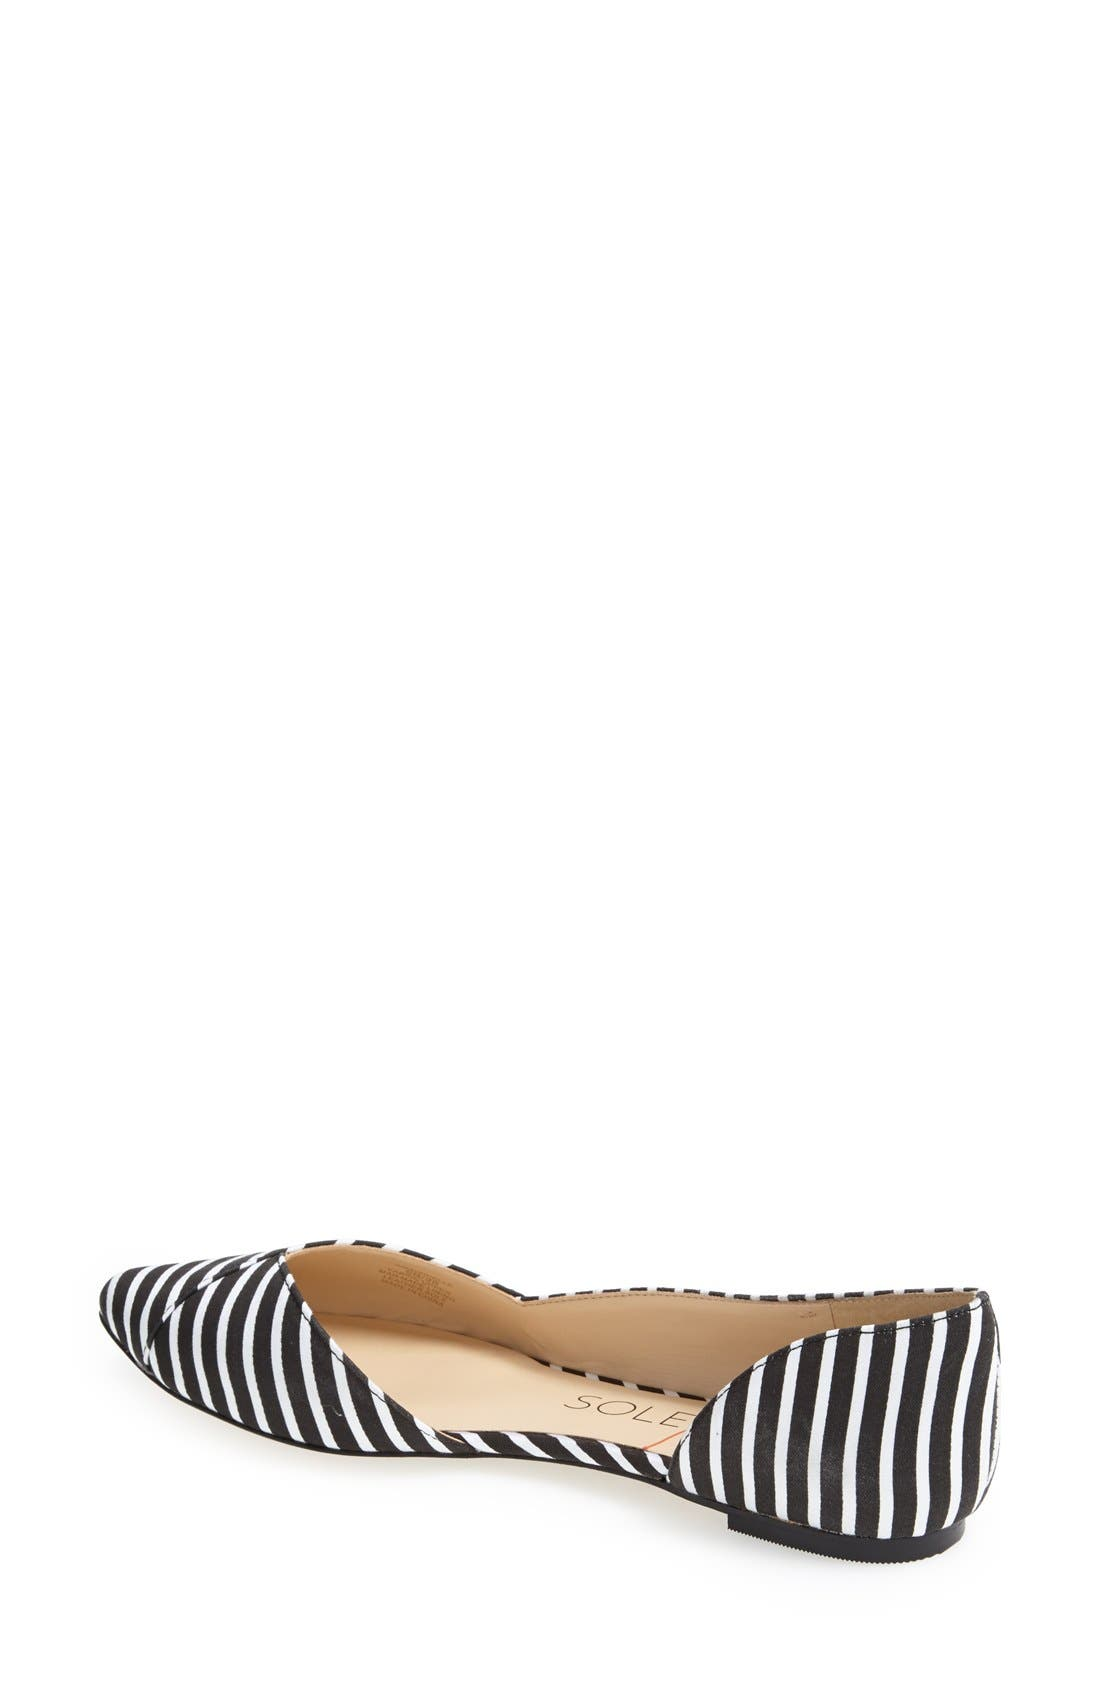 Alternate Image 2  - Sole Society 'Danielle' Pointy Toe Flat (Women)